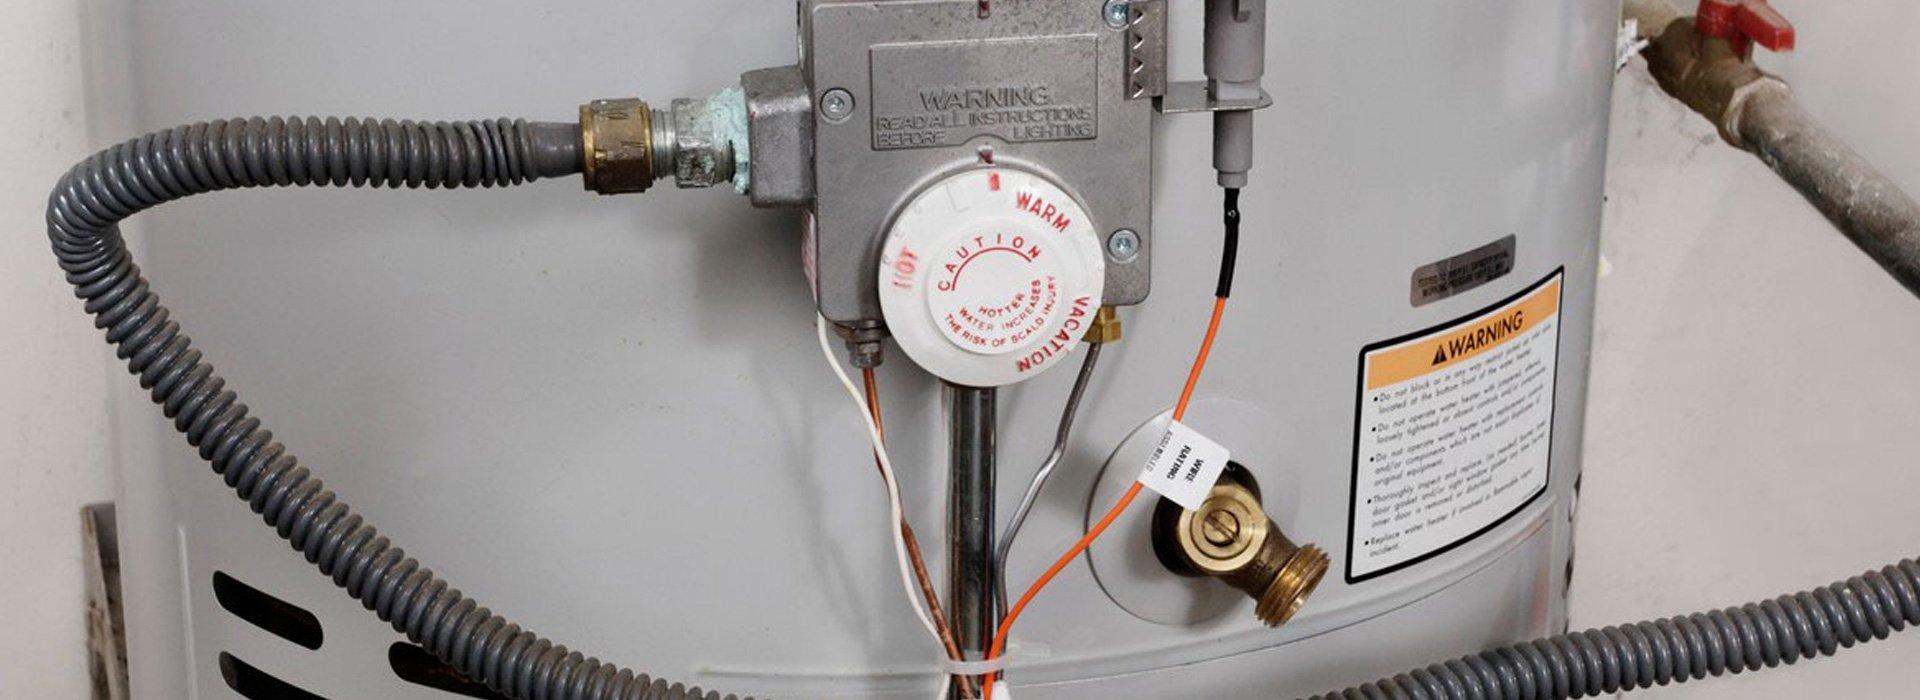 Heating Service Baltimore Md Gas Heat Appliance Repair